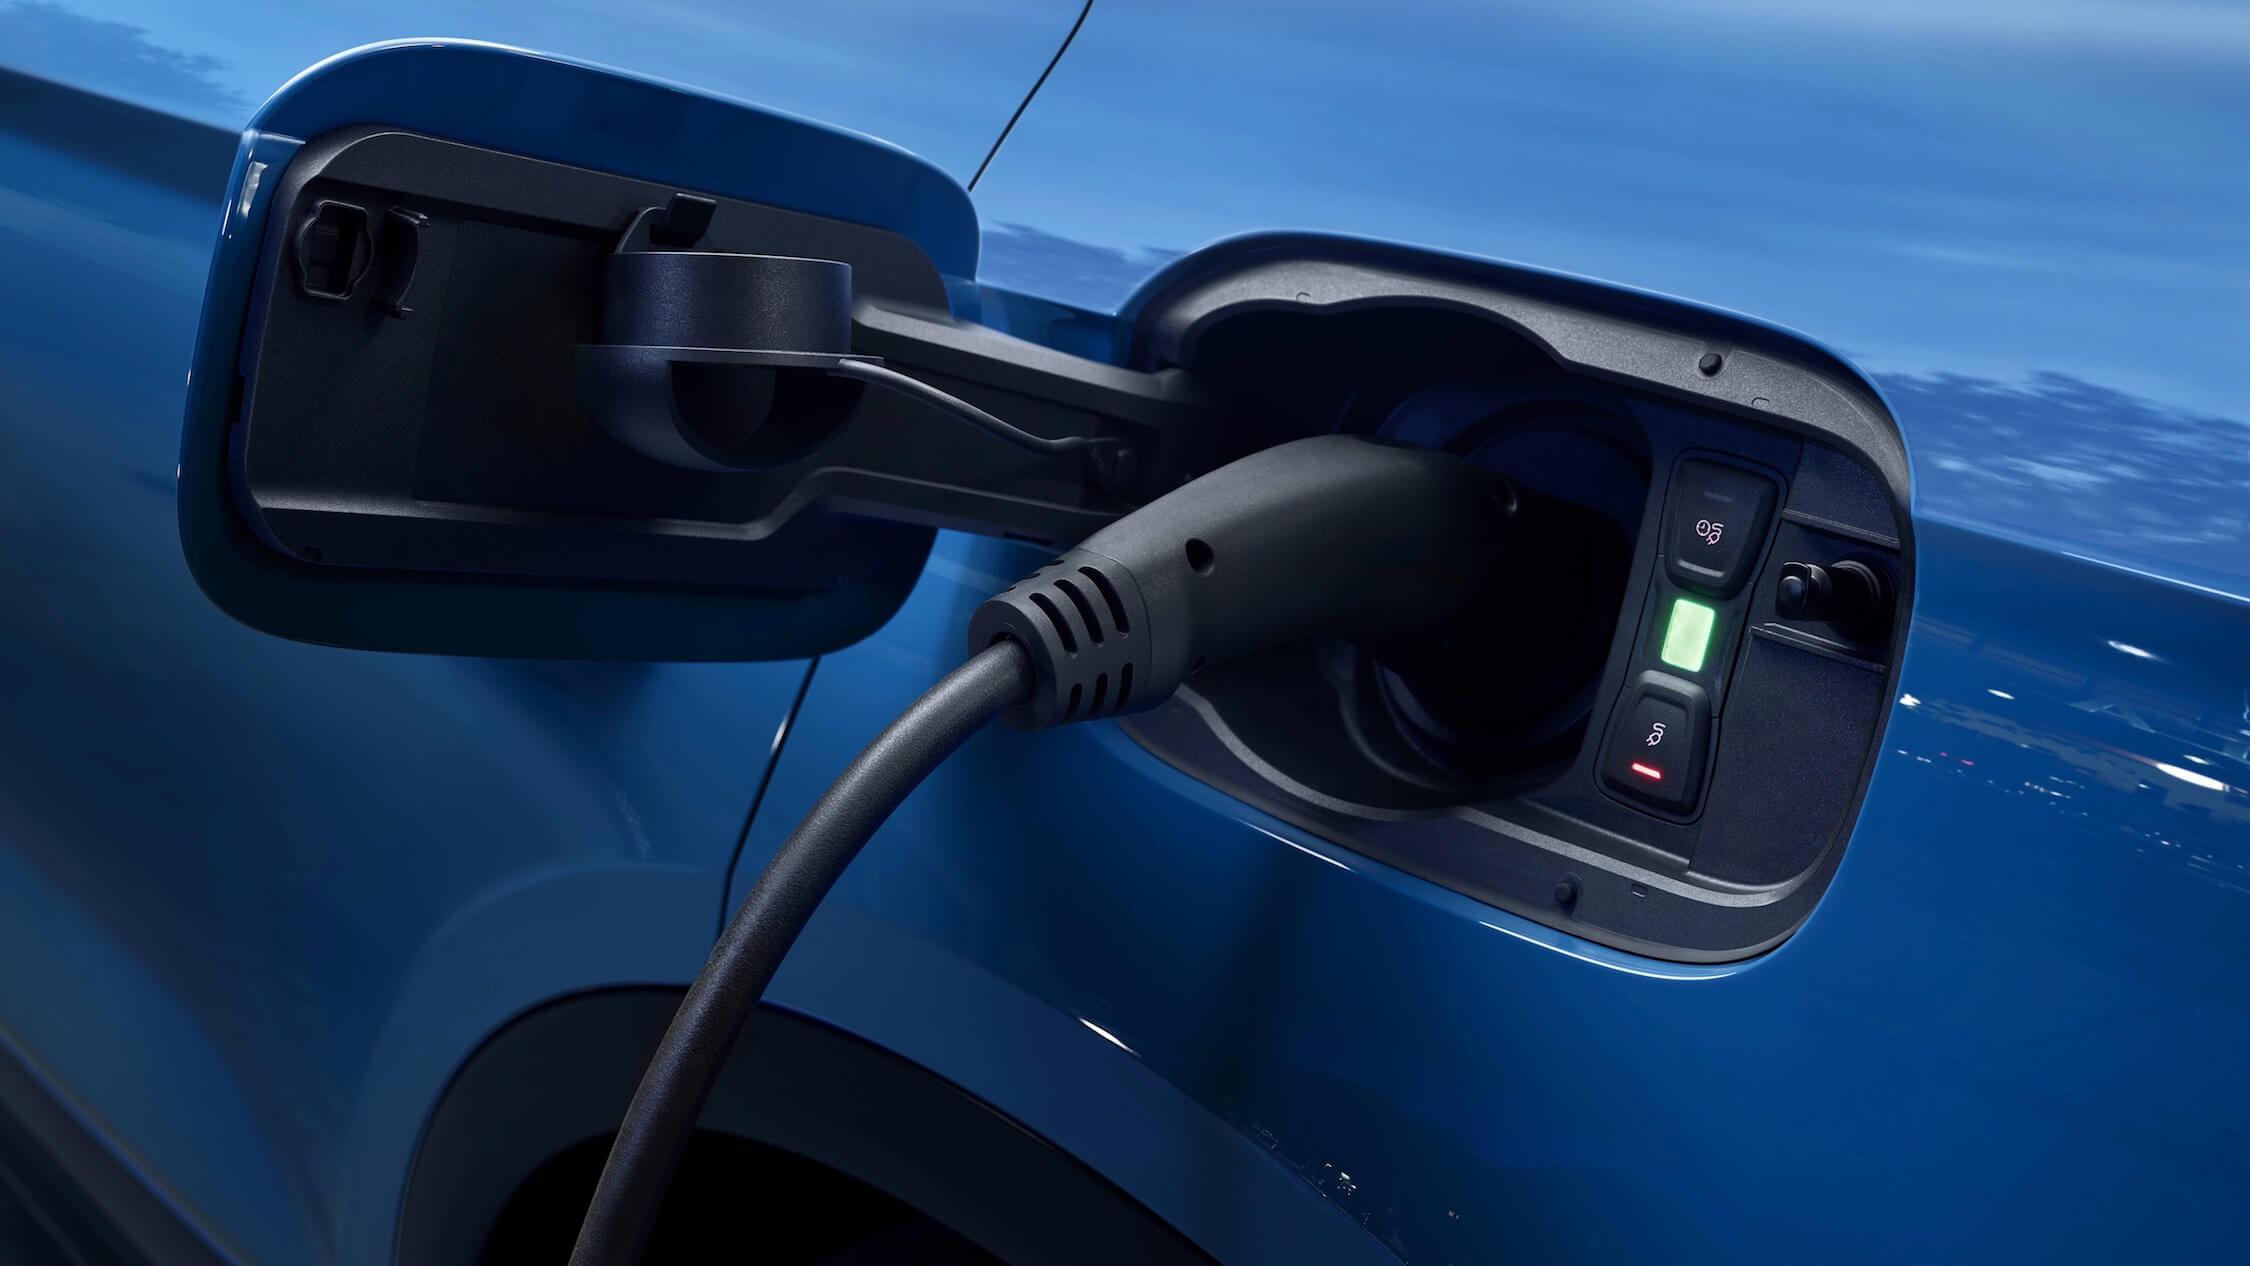 Hybrid Audi Q5 charge plug